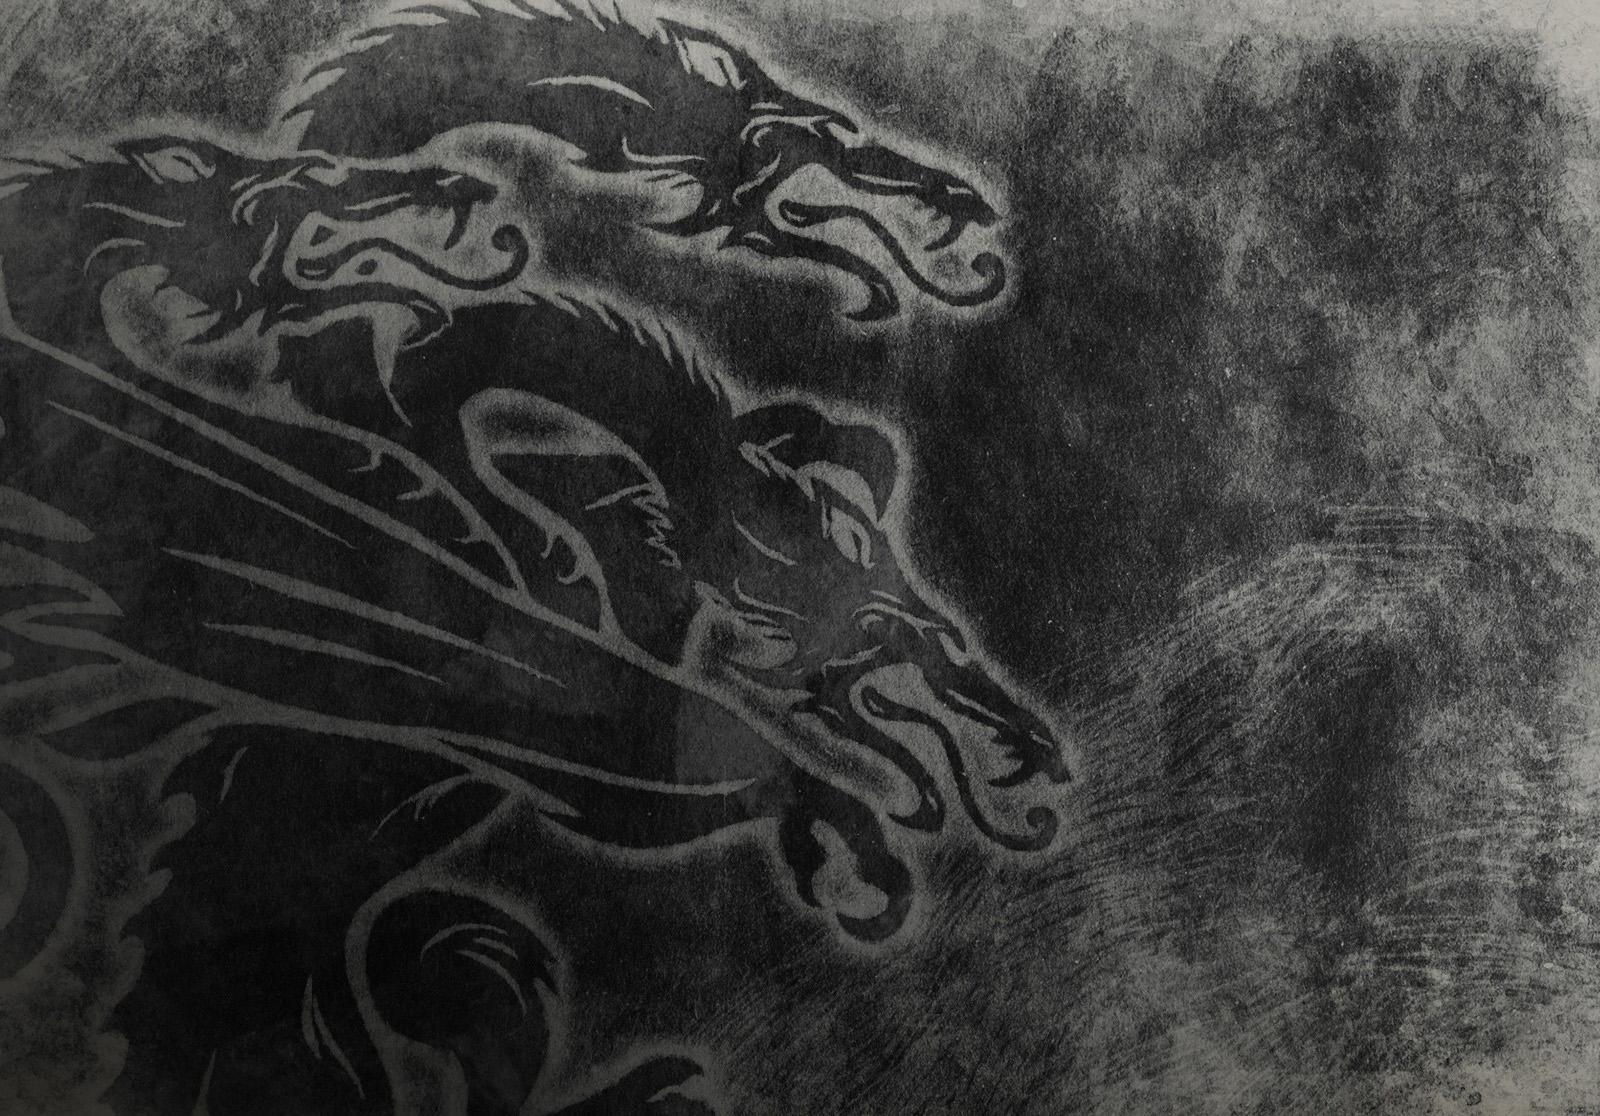 Sfondi Monocromo Opera Darte Sketch Up Arte Albero Sfondo